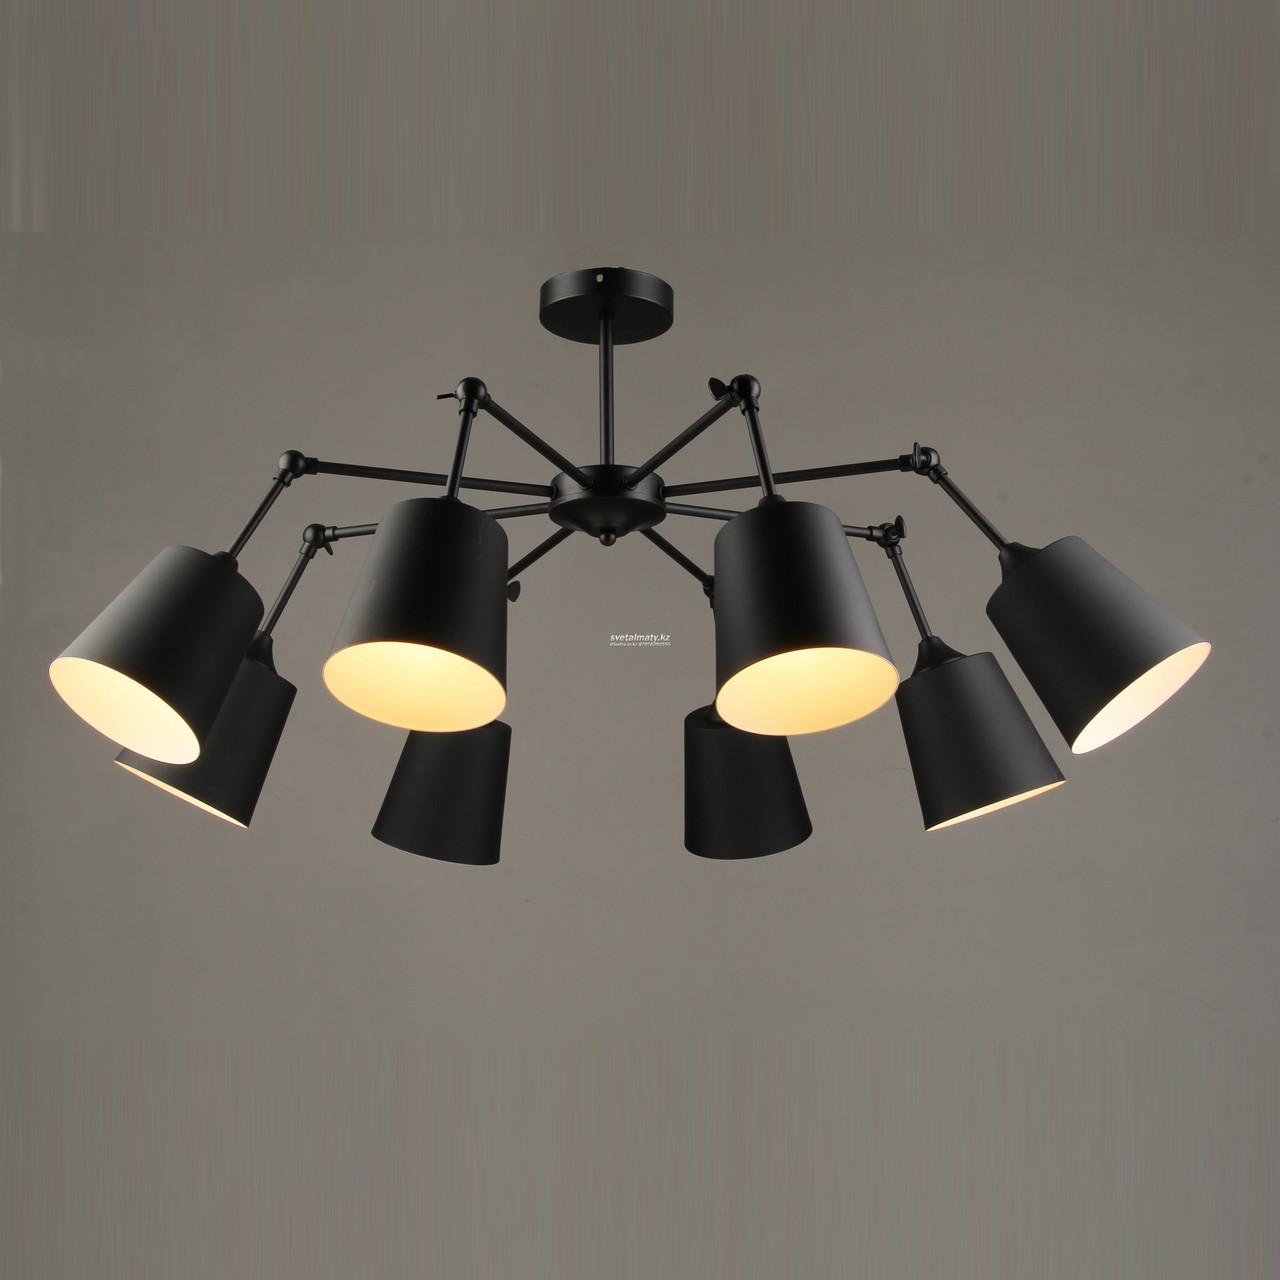 Люстра на 8 ламп черная матовая в стиле Modern